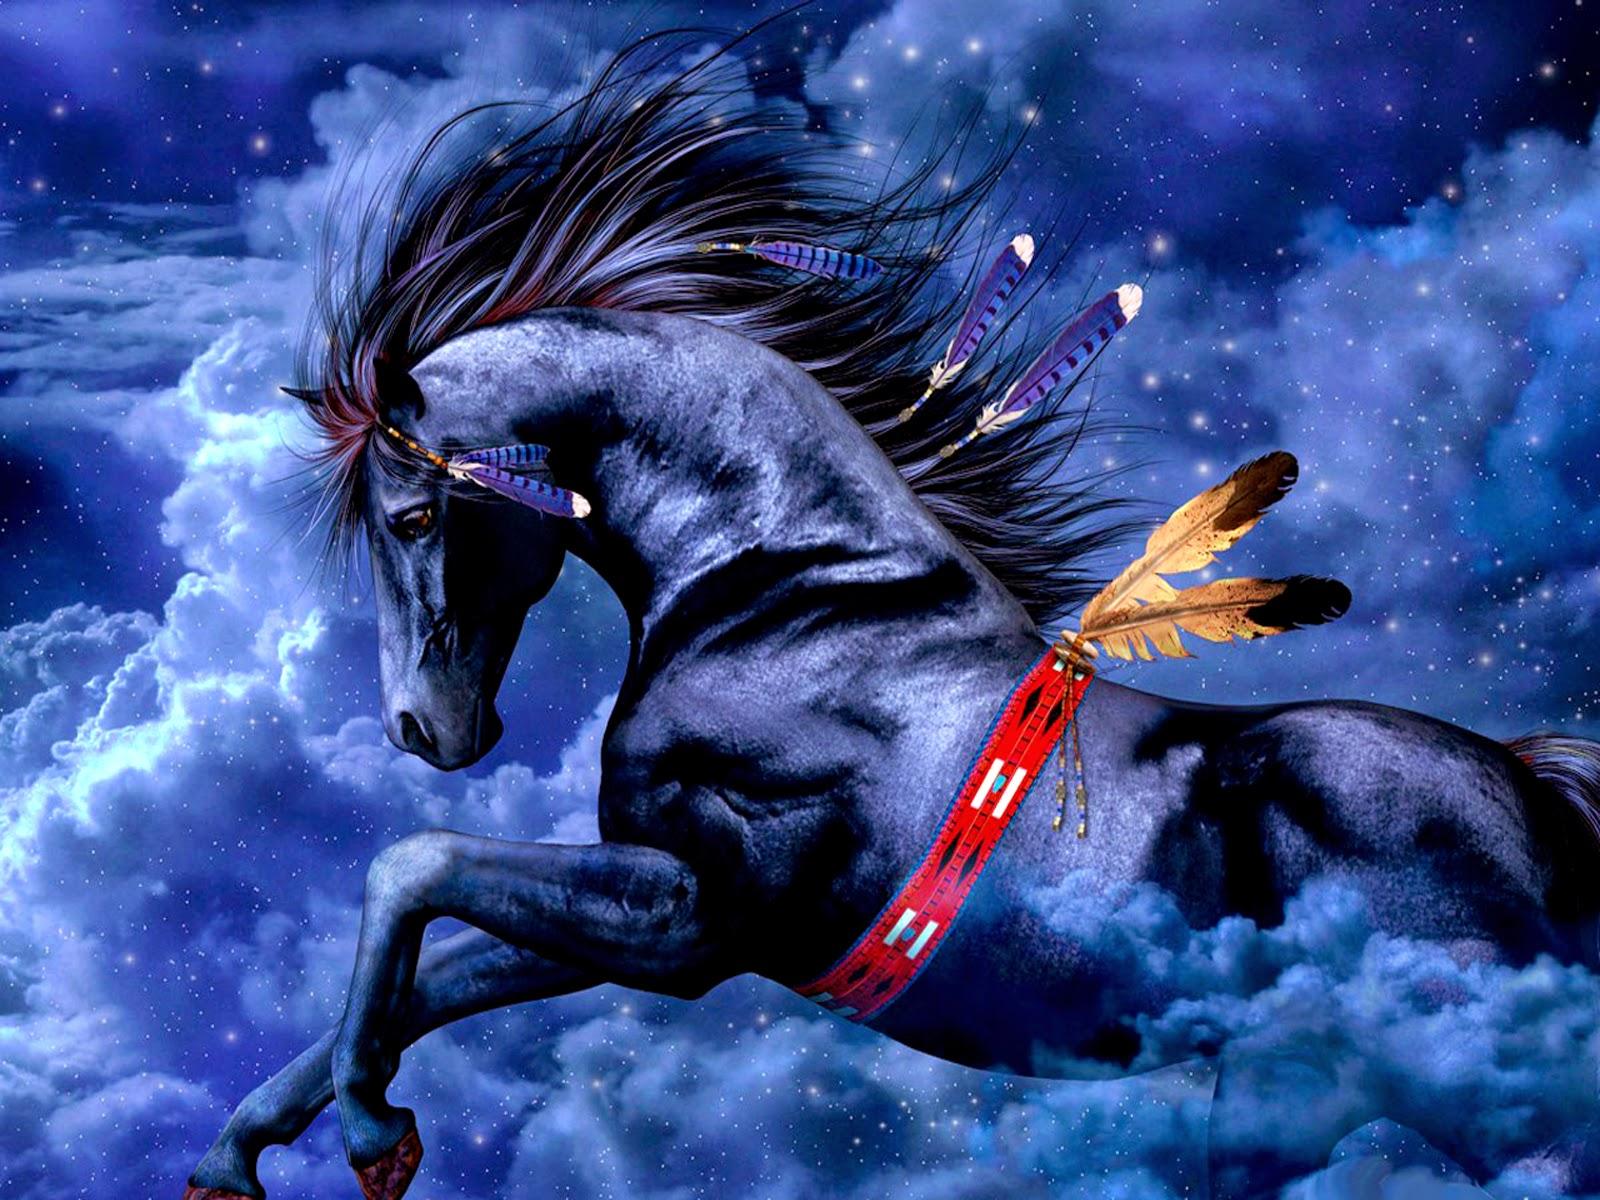 Good   Wallpaper Horse Spirit - Free+Animal+Wallpaper+HD+%252828%2529  2018_164299.jpg